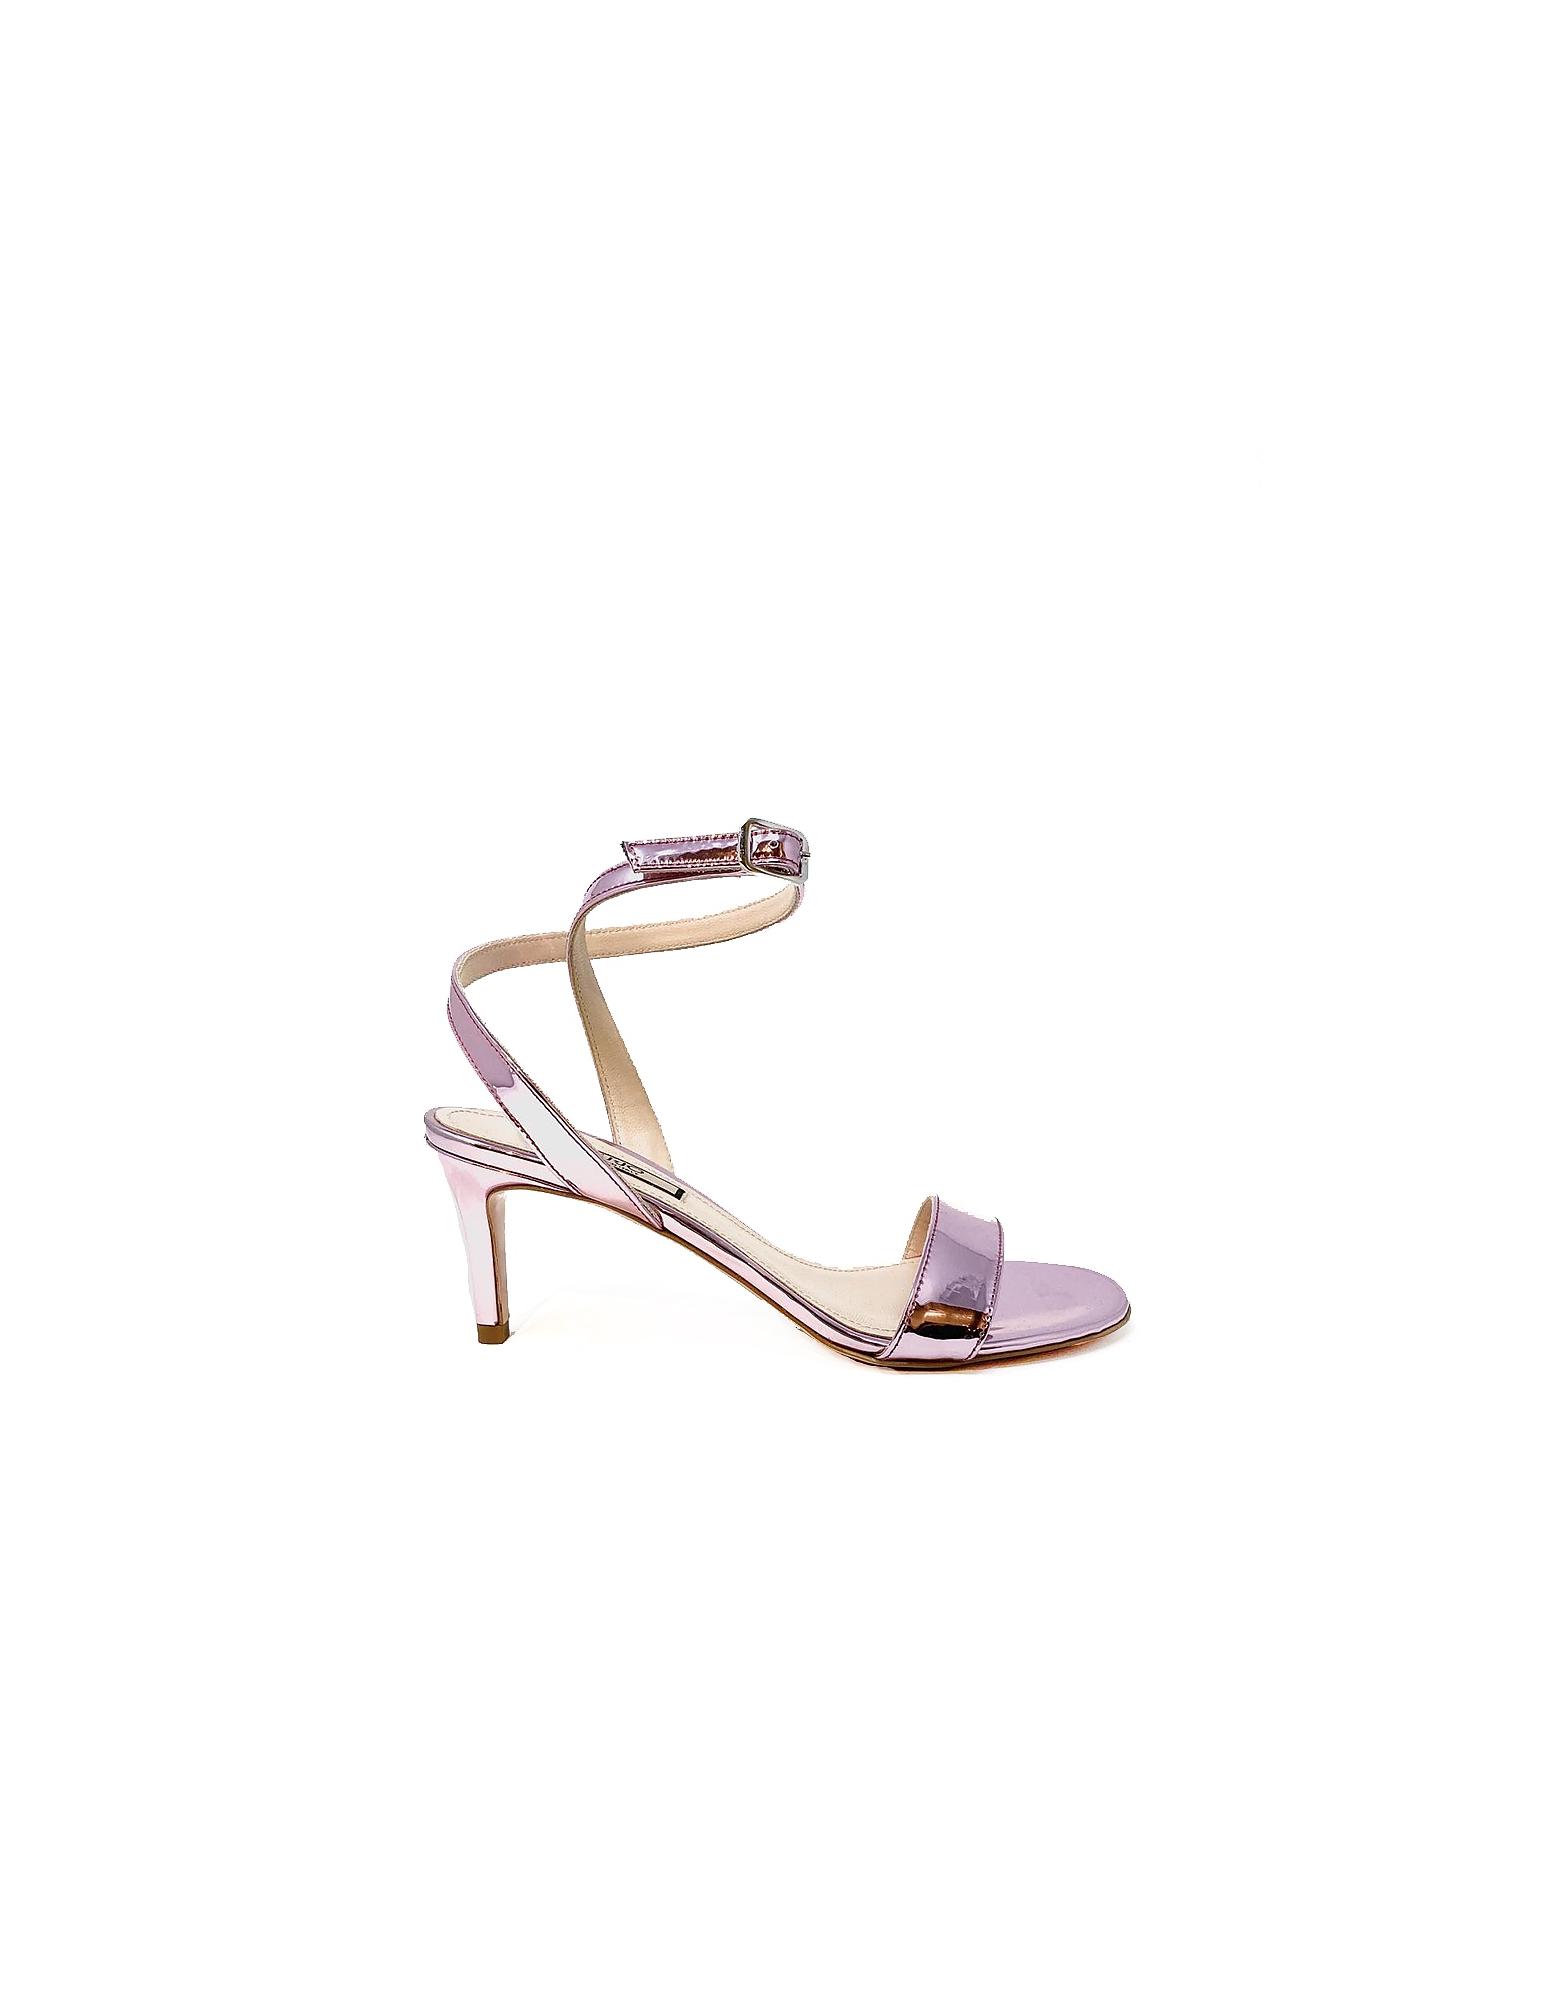 Liu Jo Designer Shoes, Metallic Lilac High Heel Sandal Shoes